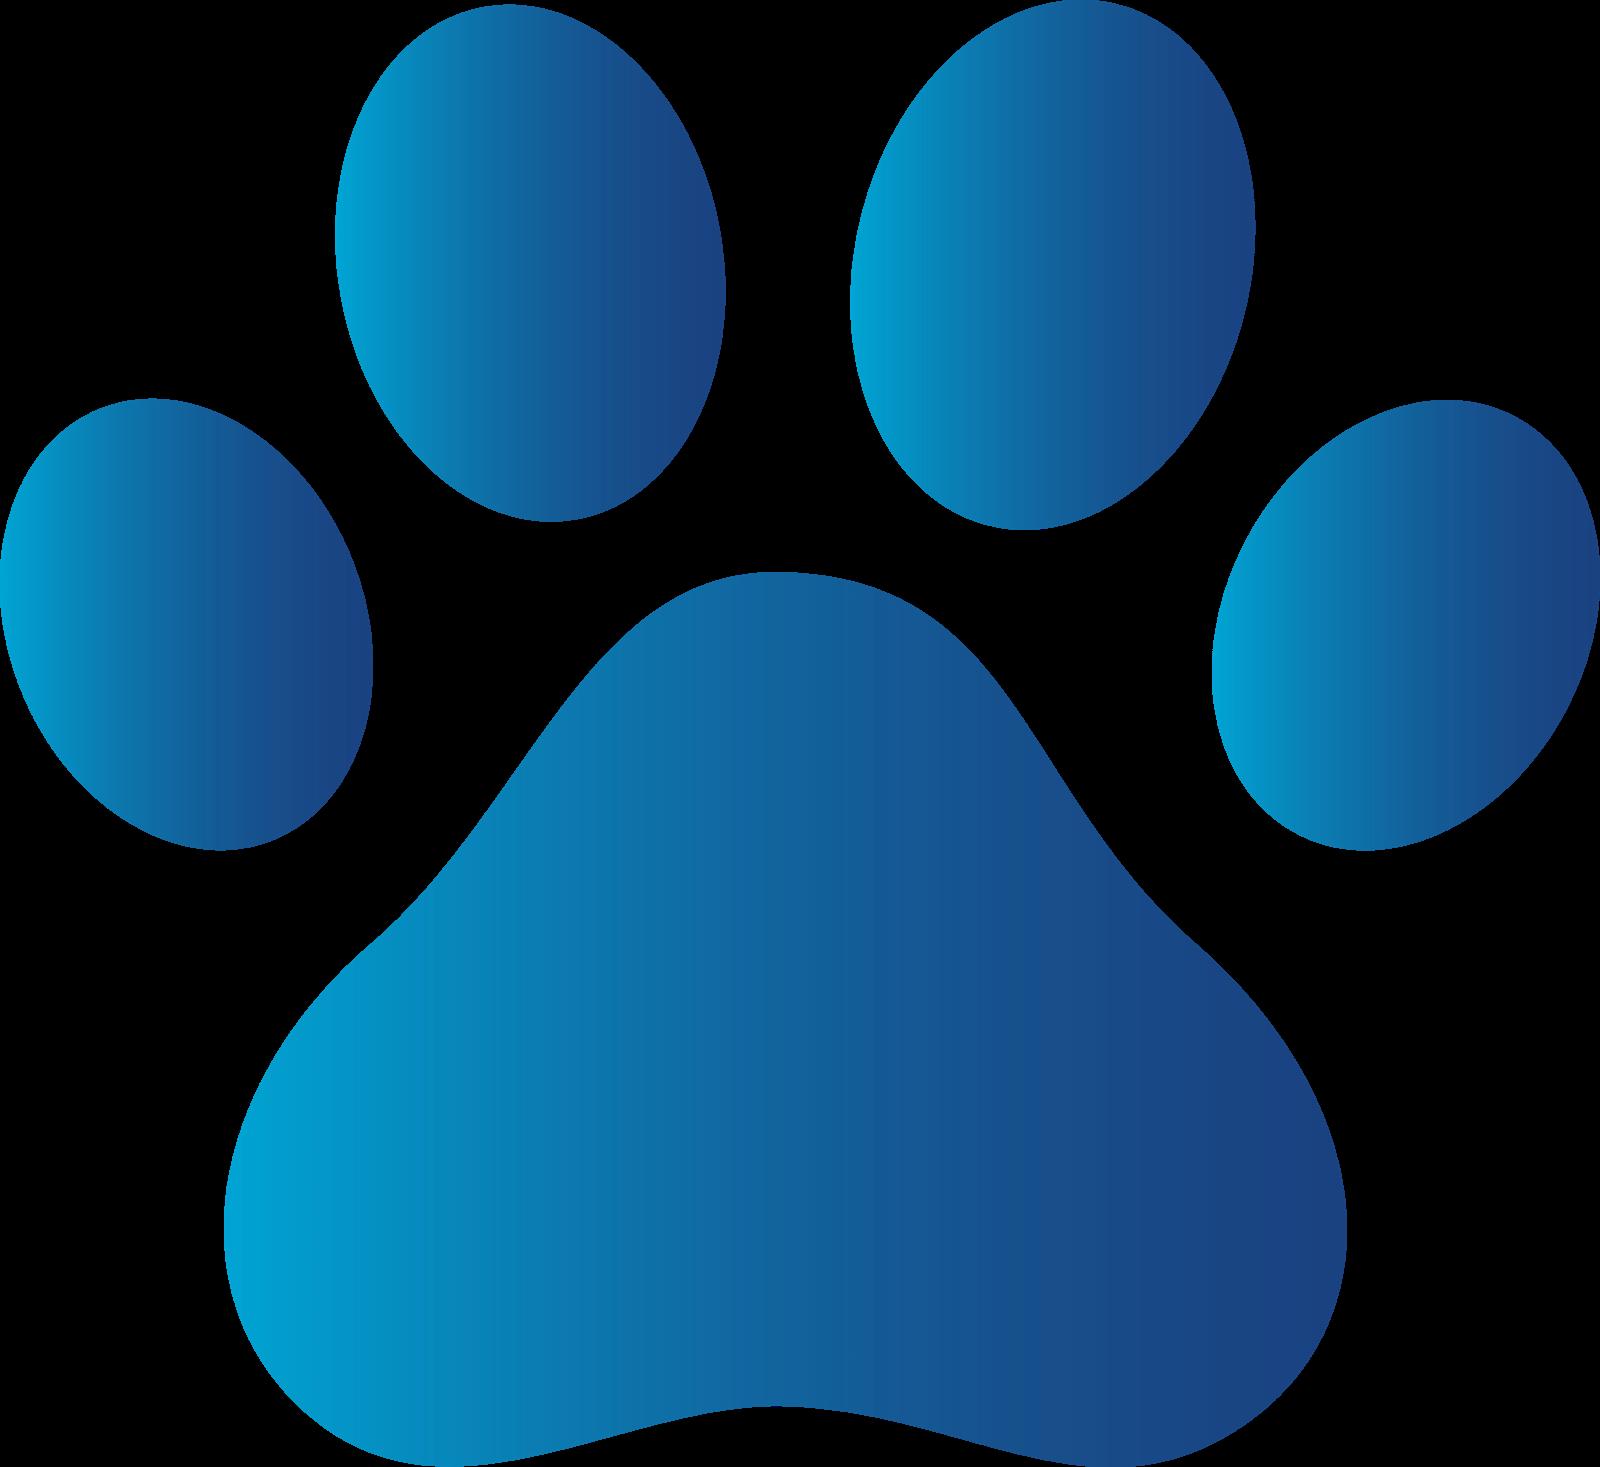 7 Images of Printable Dog Paw Prints